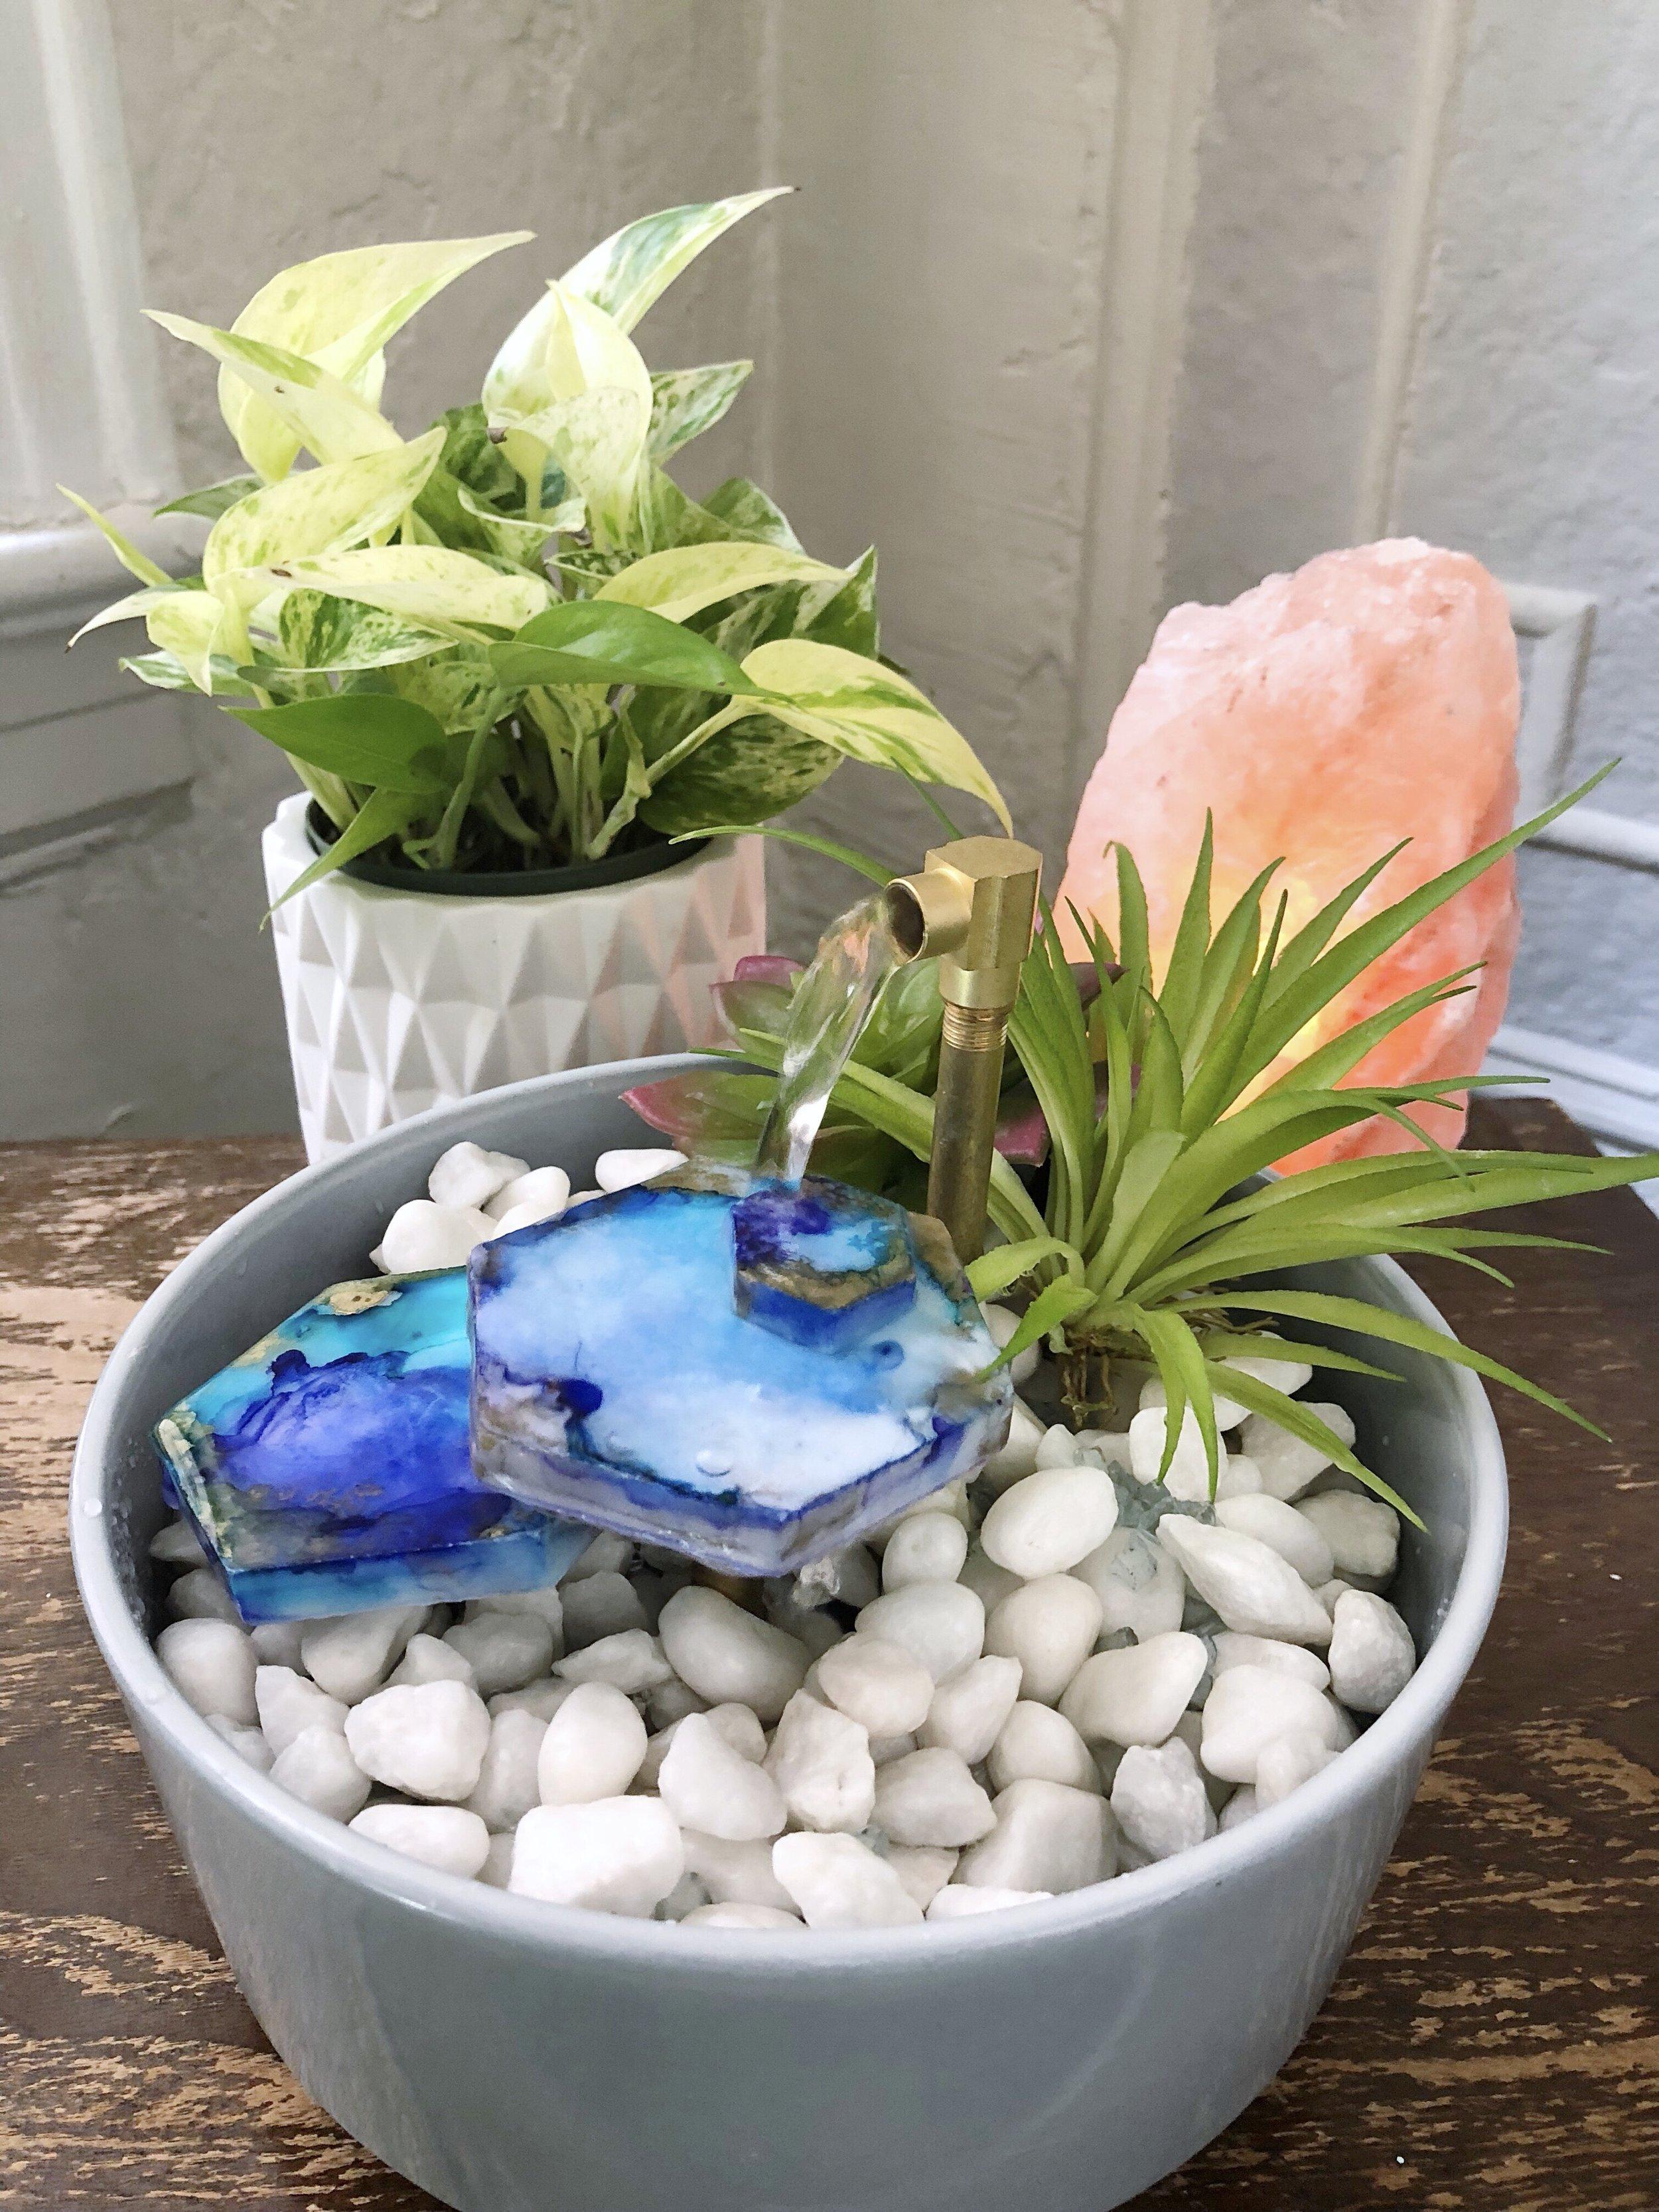 DIY Relaxing Tabletop Fountain - Create your own zen garden with a few inexpensive materials. #tabletopfountain #fountain #waterfall #relaxing #relaxingdiy #homedecor #stressrelief #alcoholink #geode #tilediy #tiles #waterpump #summer #spring #craftylumberjacks